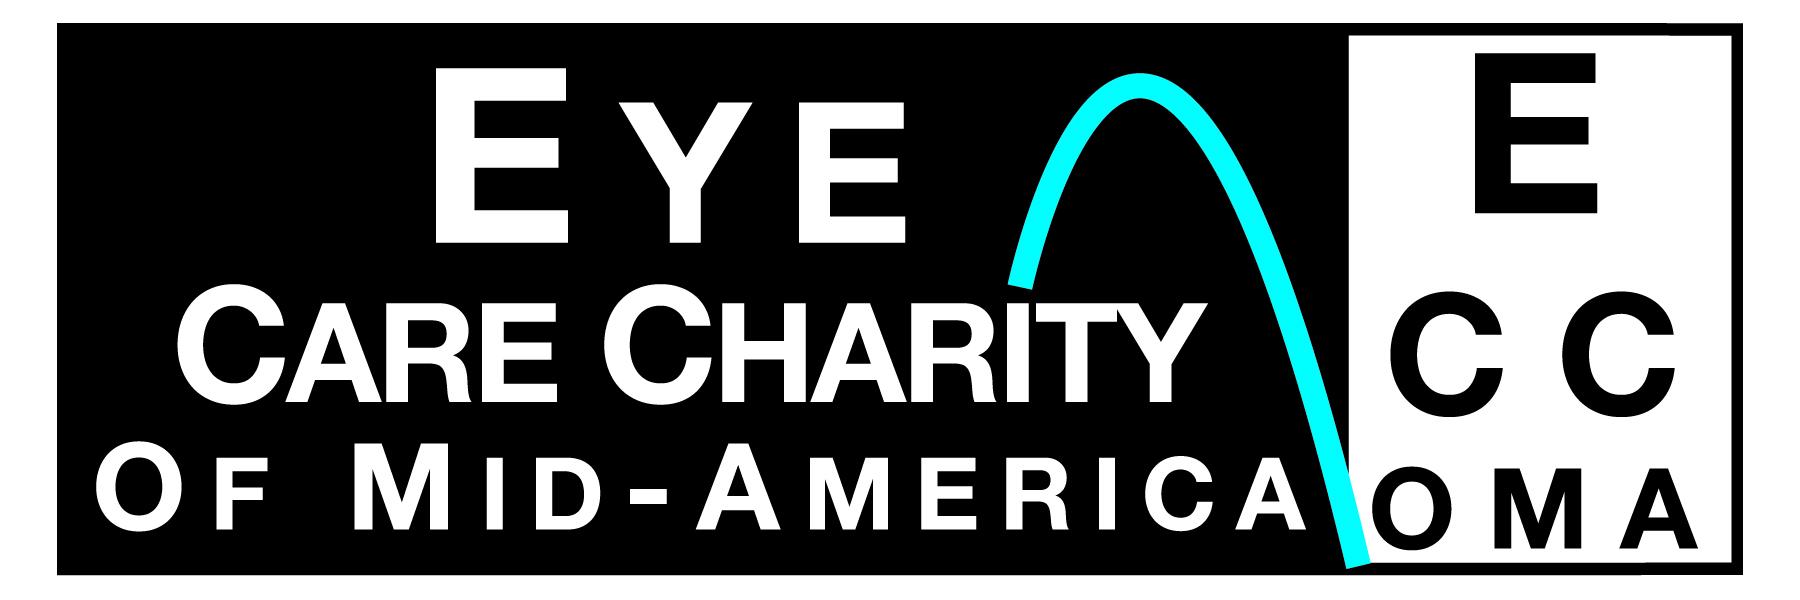 Eye Care Charity of Mid-America logo